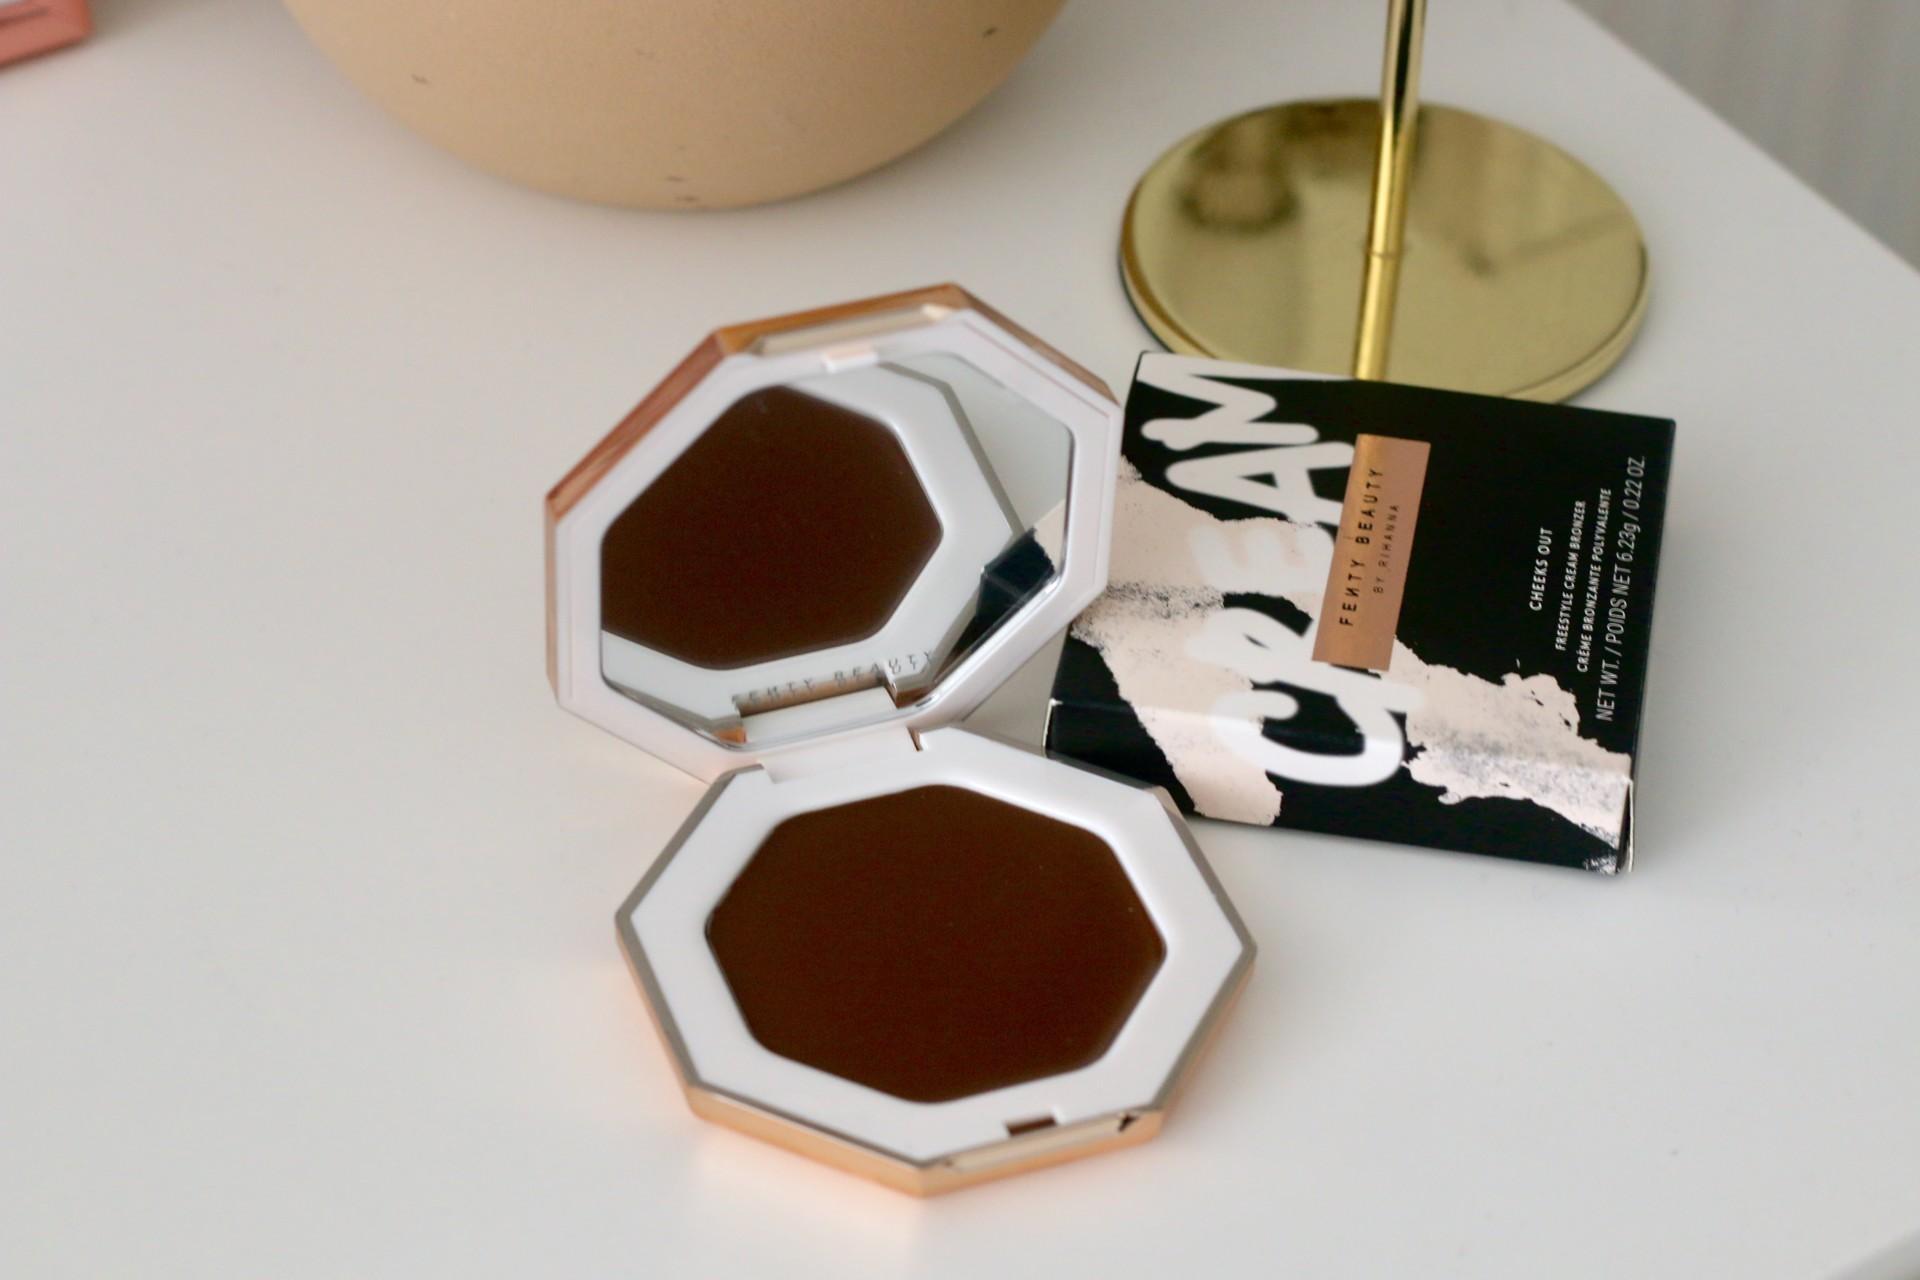 Fenty beauty Cream bronzer CHOCOLATE